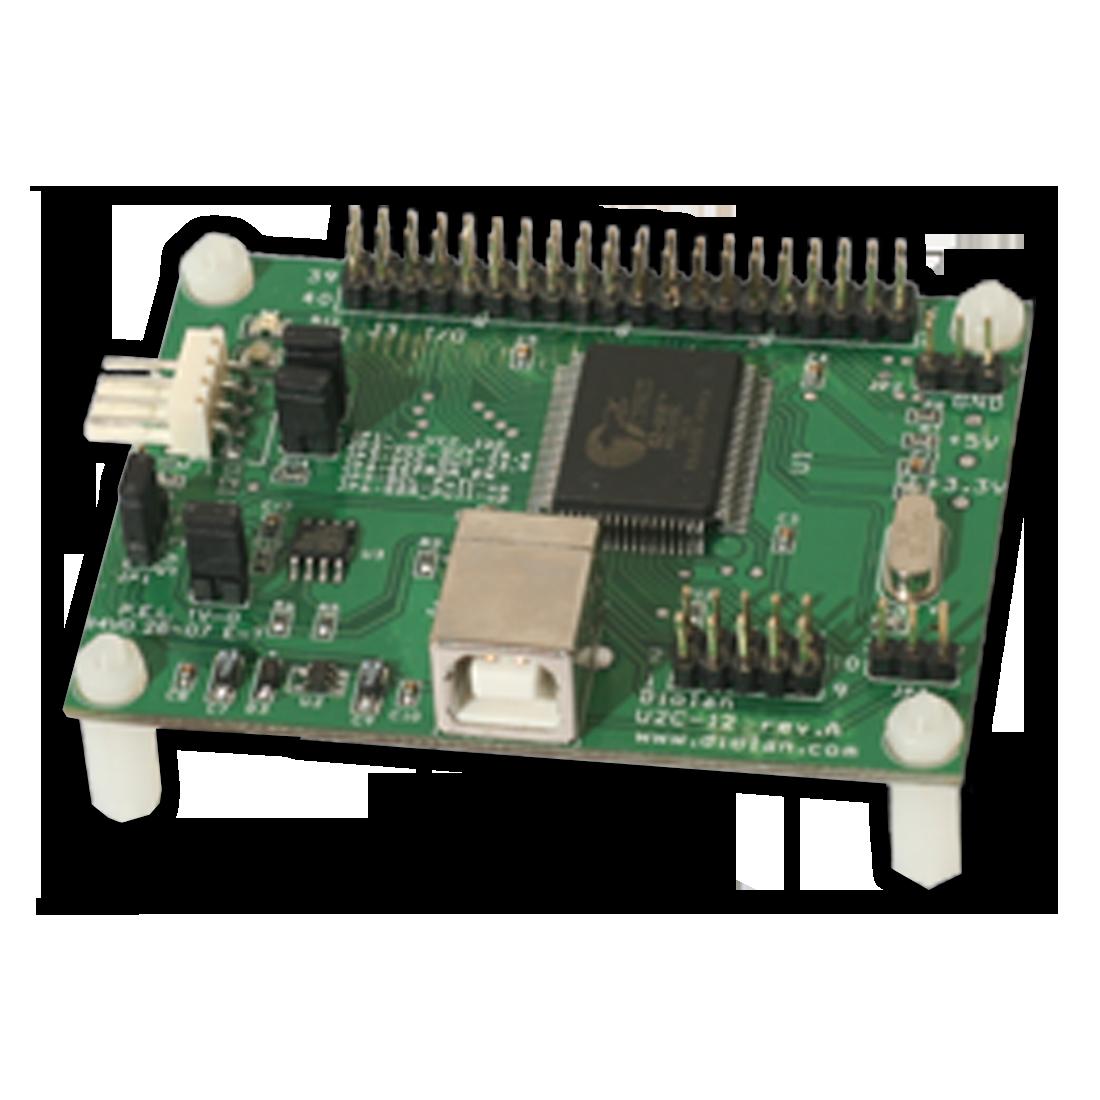 USB-I2C/SPI/GPIO Adapter